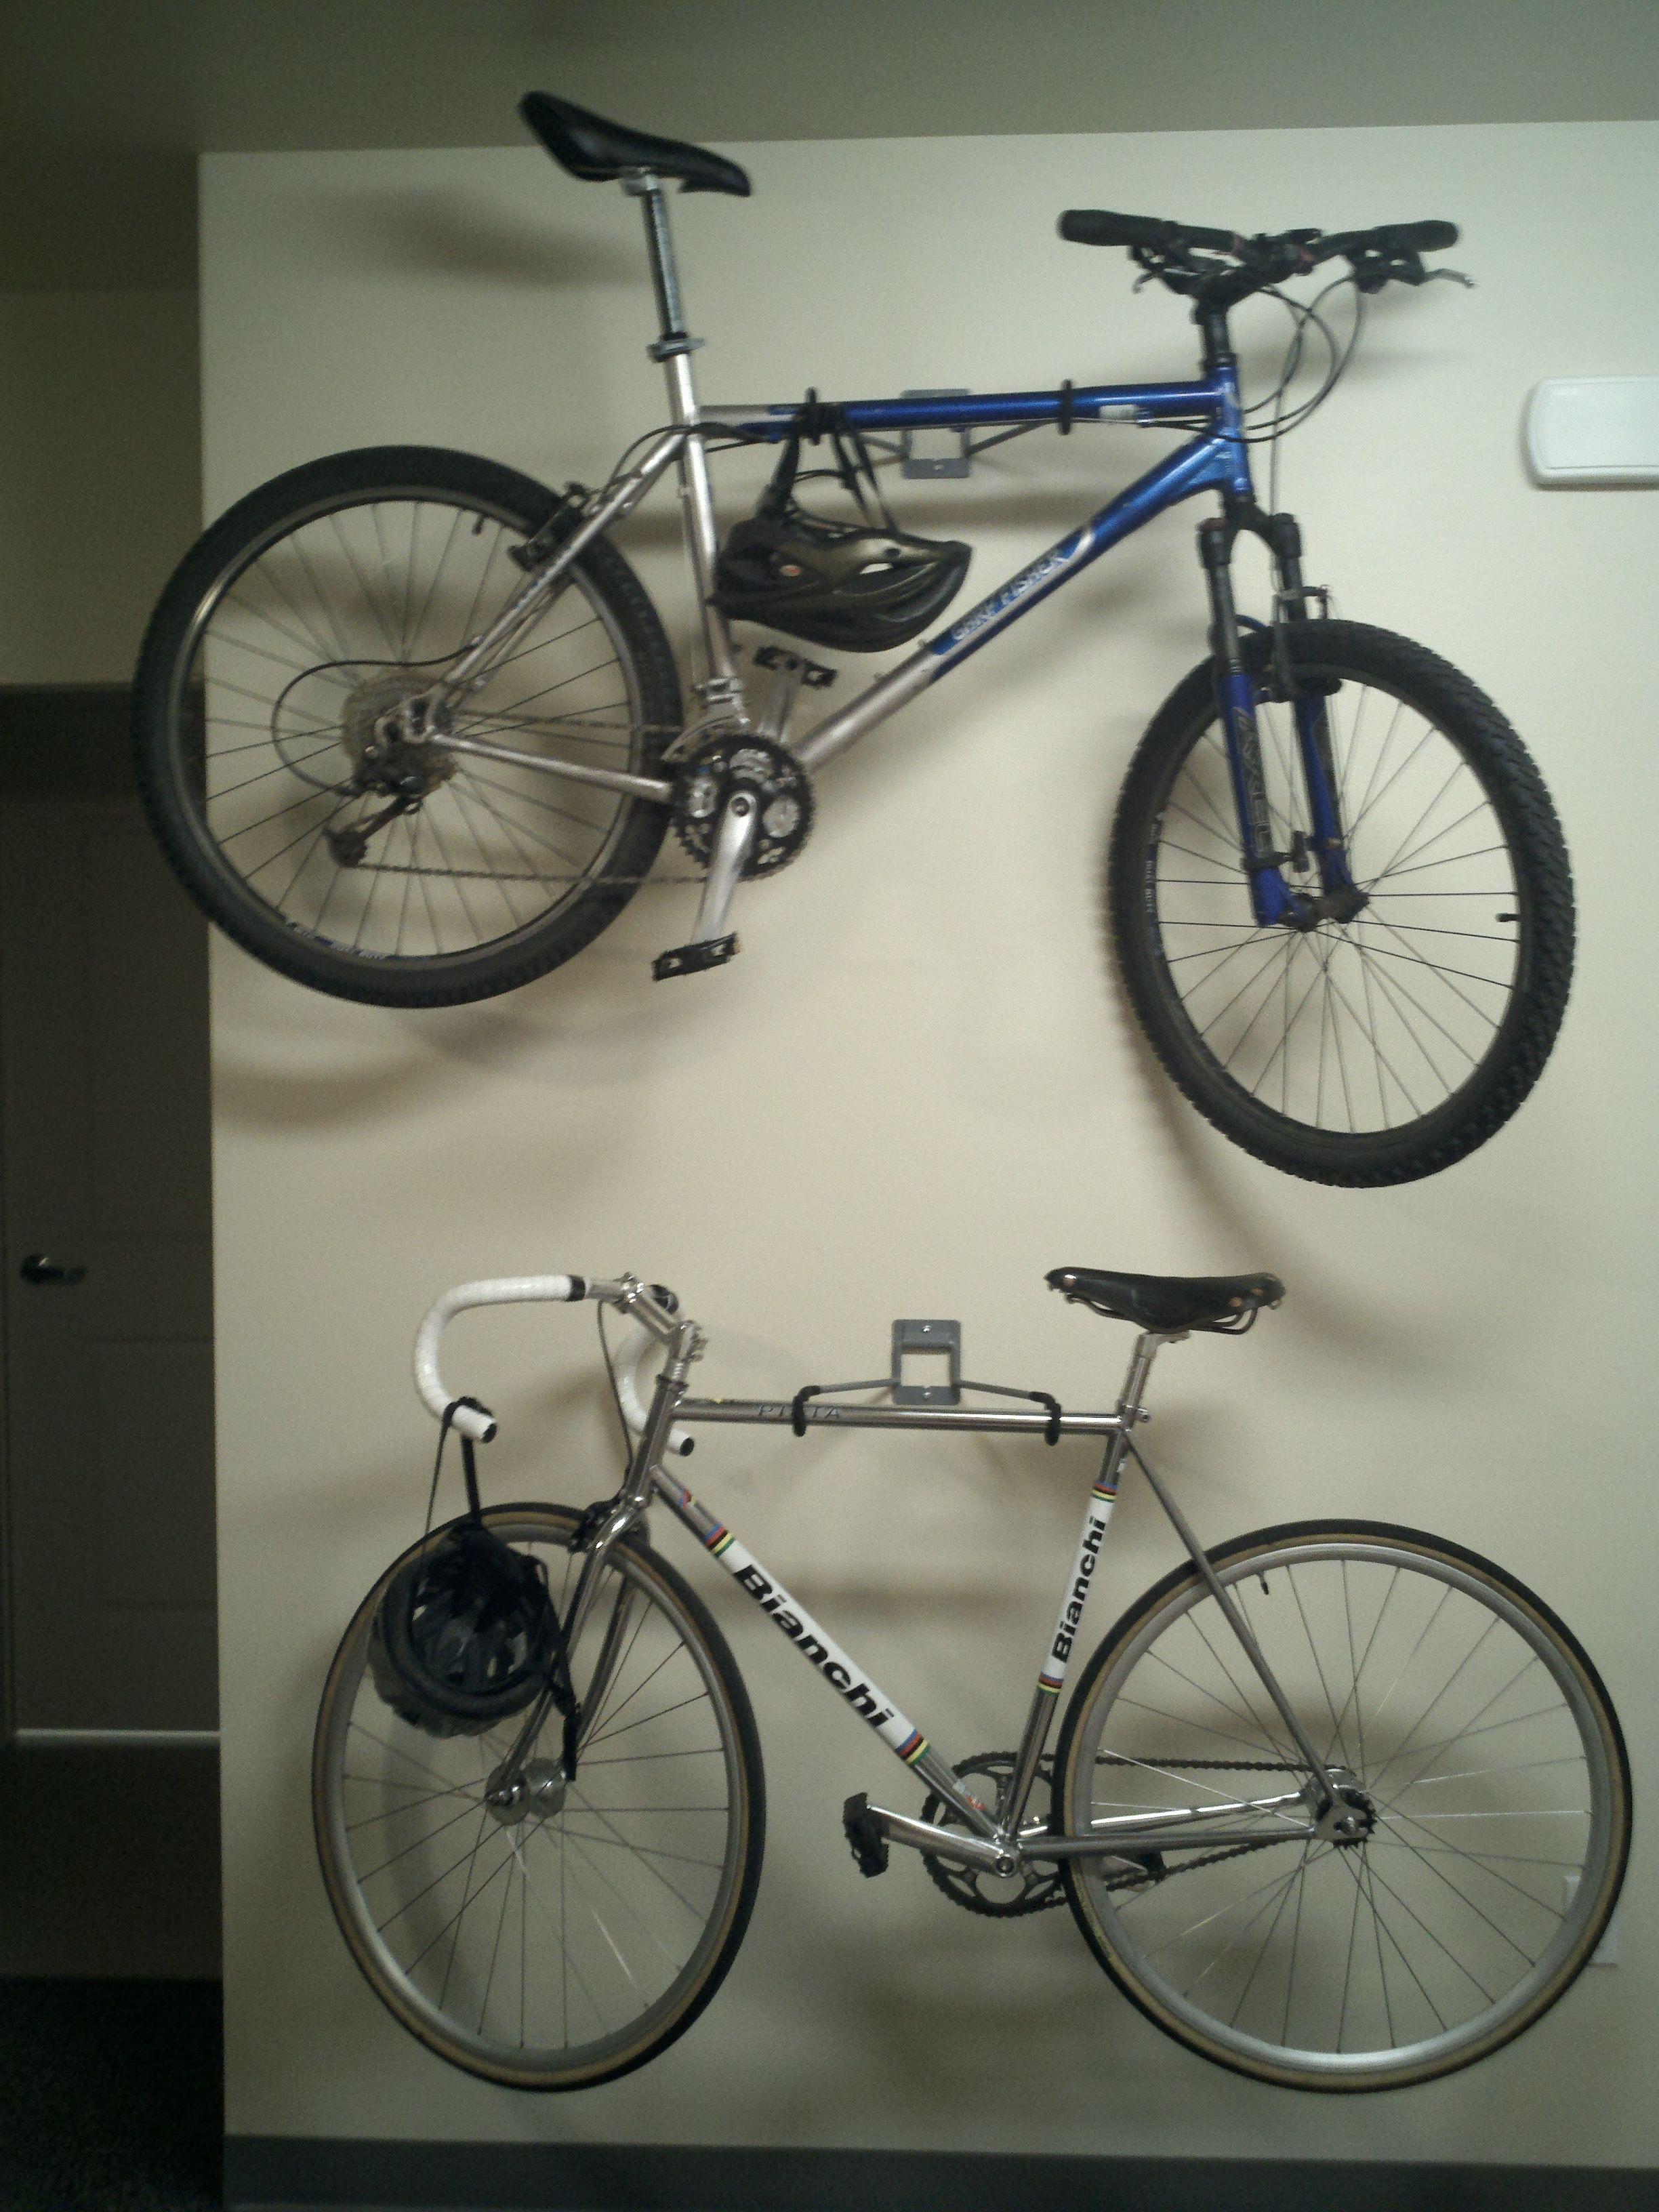 Functional Art Is Rad Bike Hangers Courtesy Of Lowes Bike